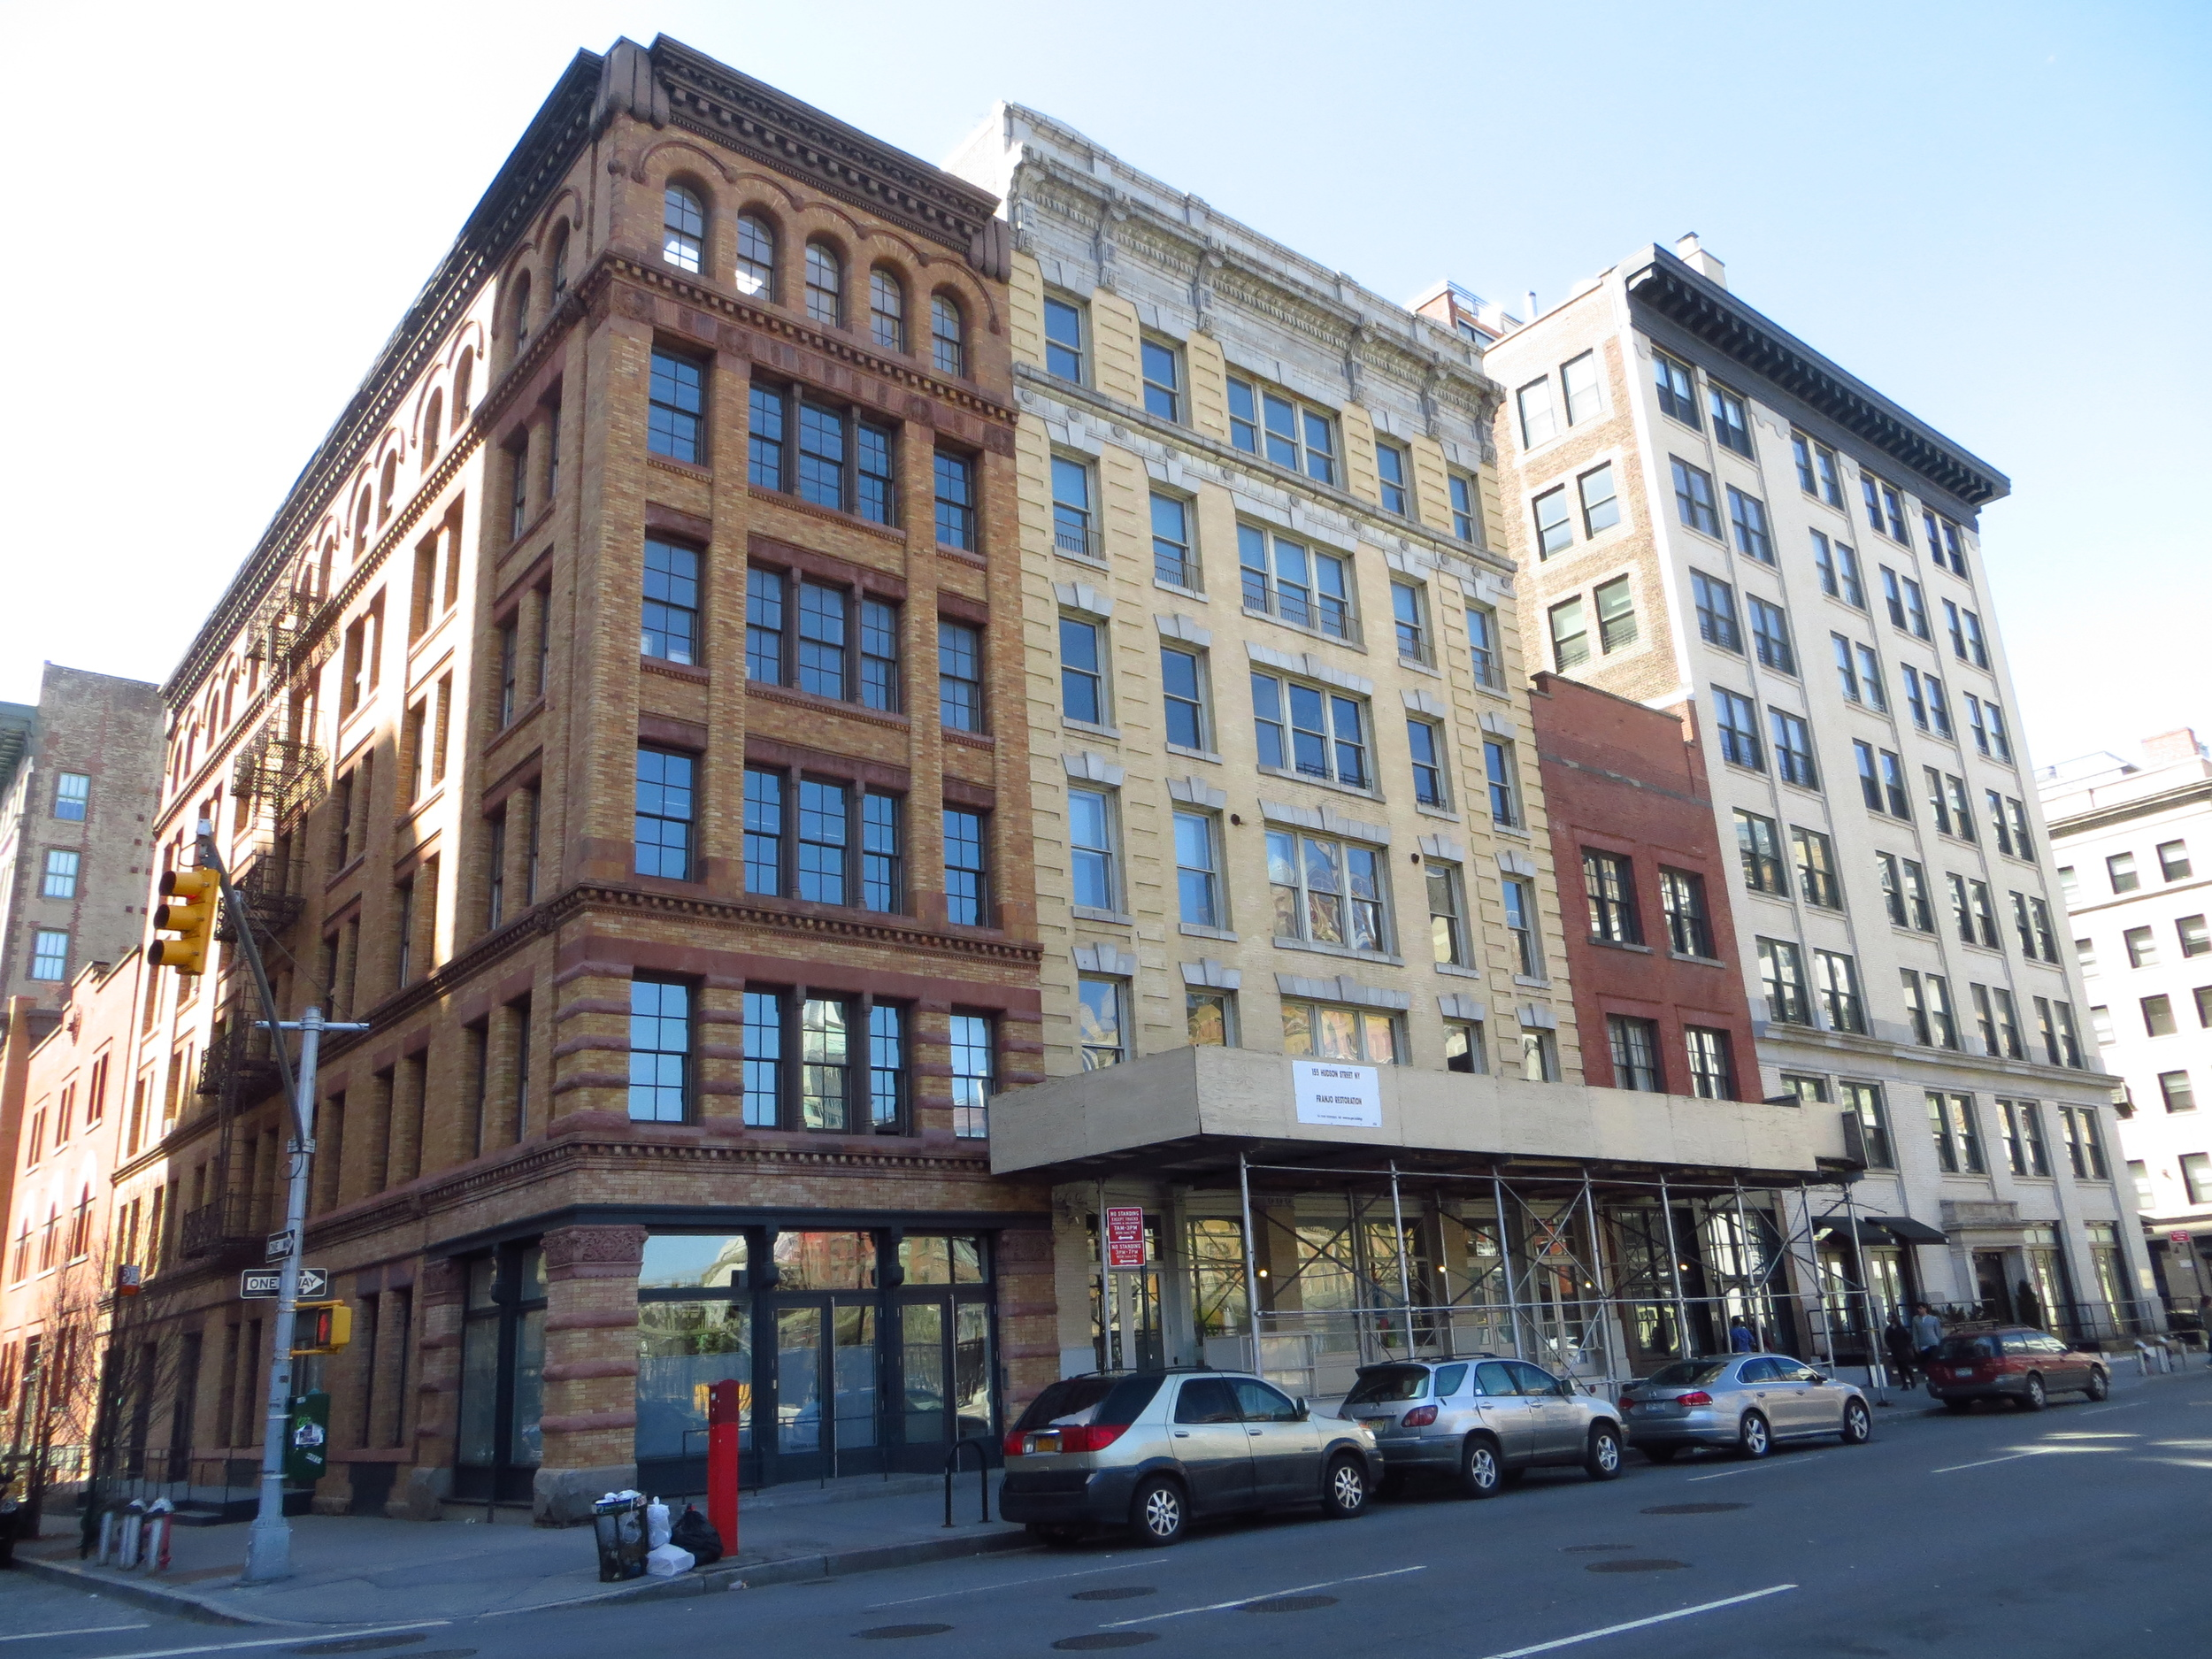 Tribeca buildings